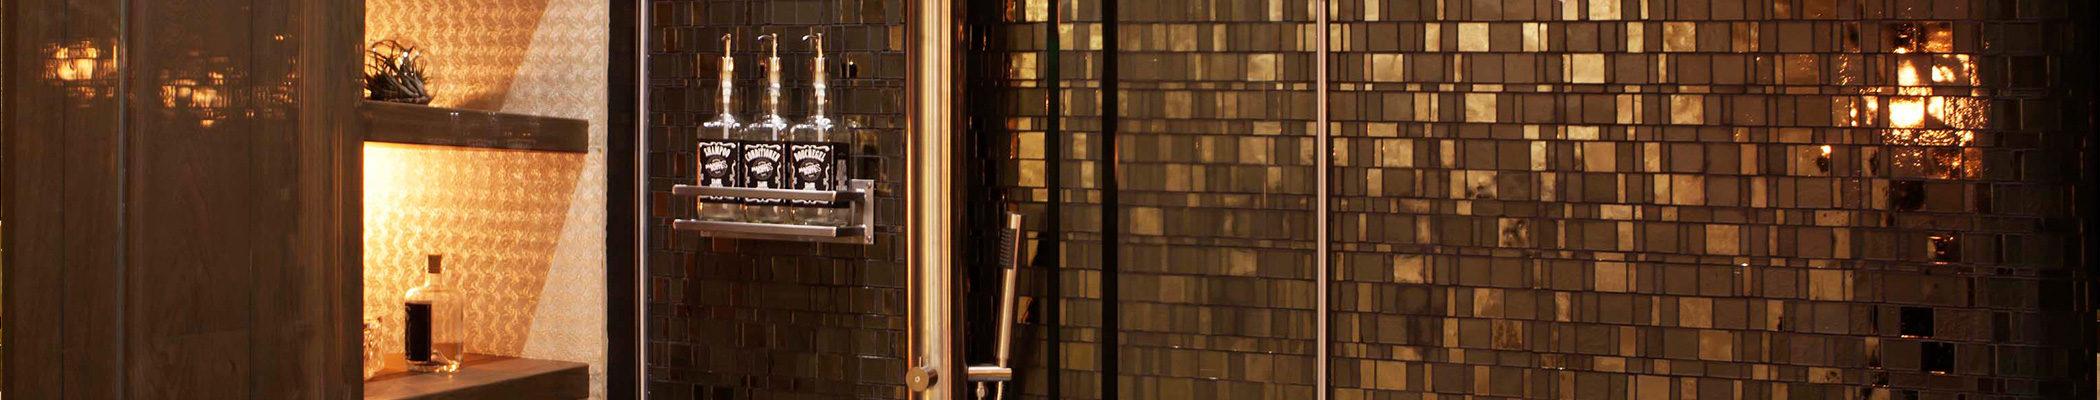 boutique-hotel-zaandam-manzo-loft-badkamer